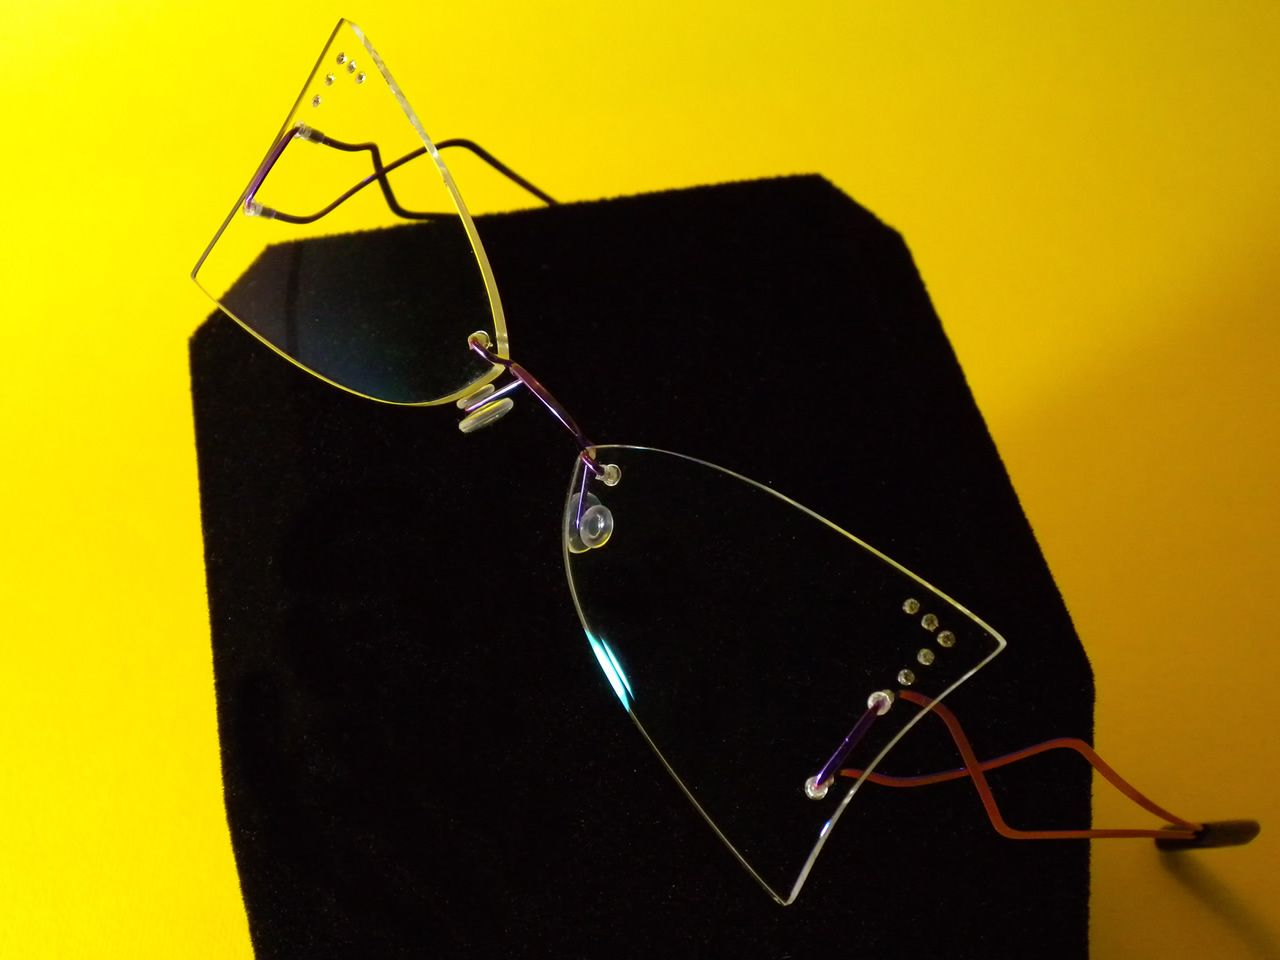 Butterfly eyeglasses by Leggerissimi #rimless #eyewear #eyeglasses #butterfly